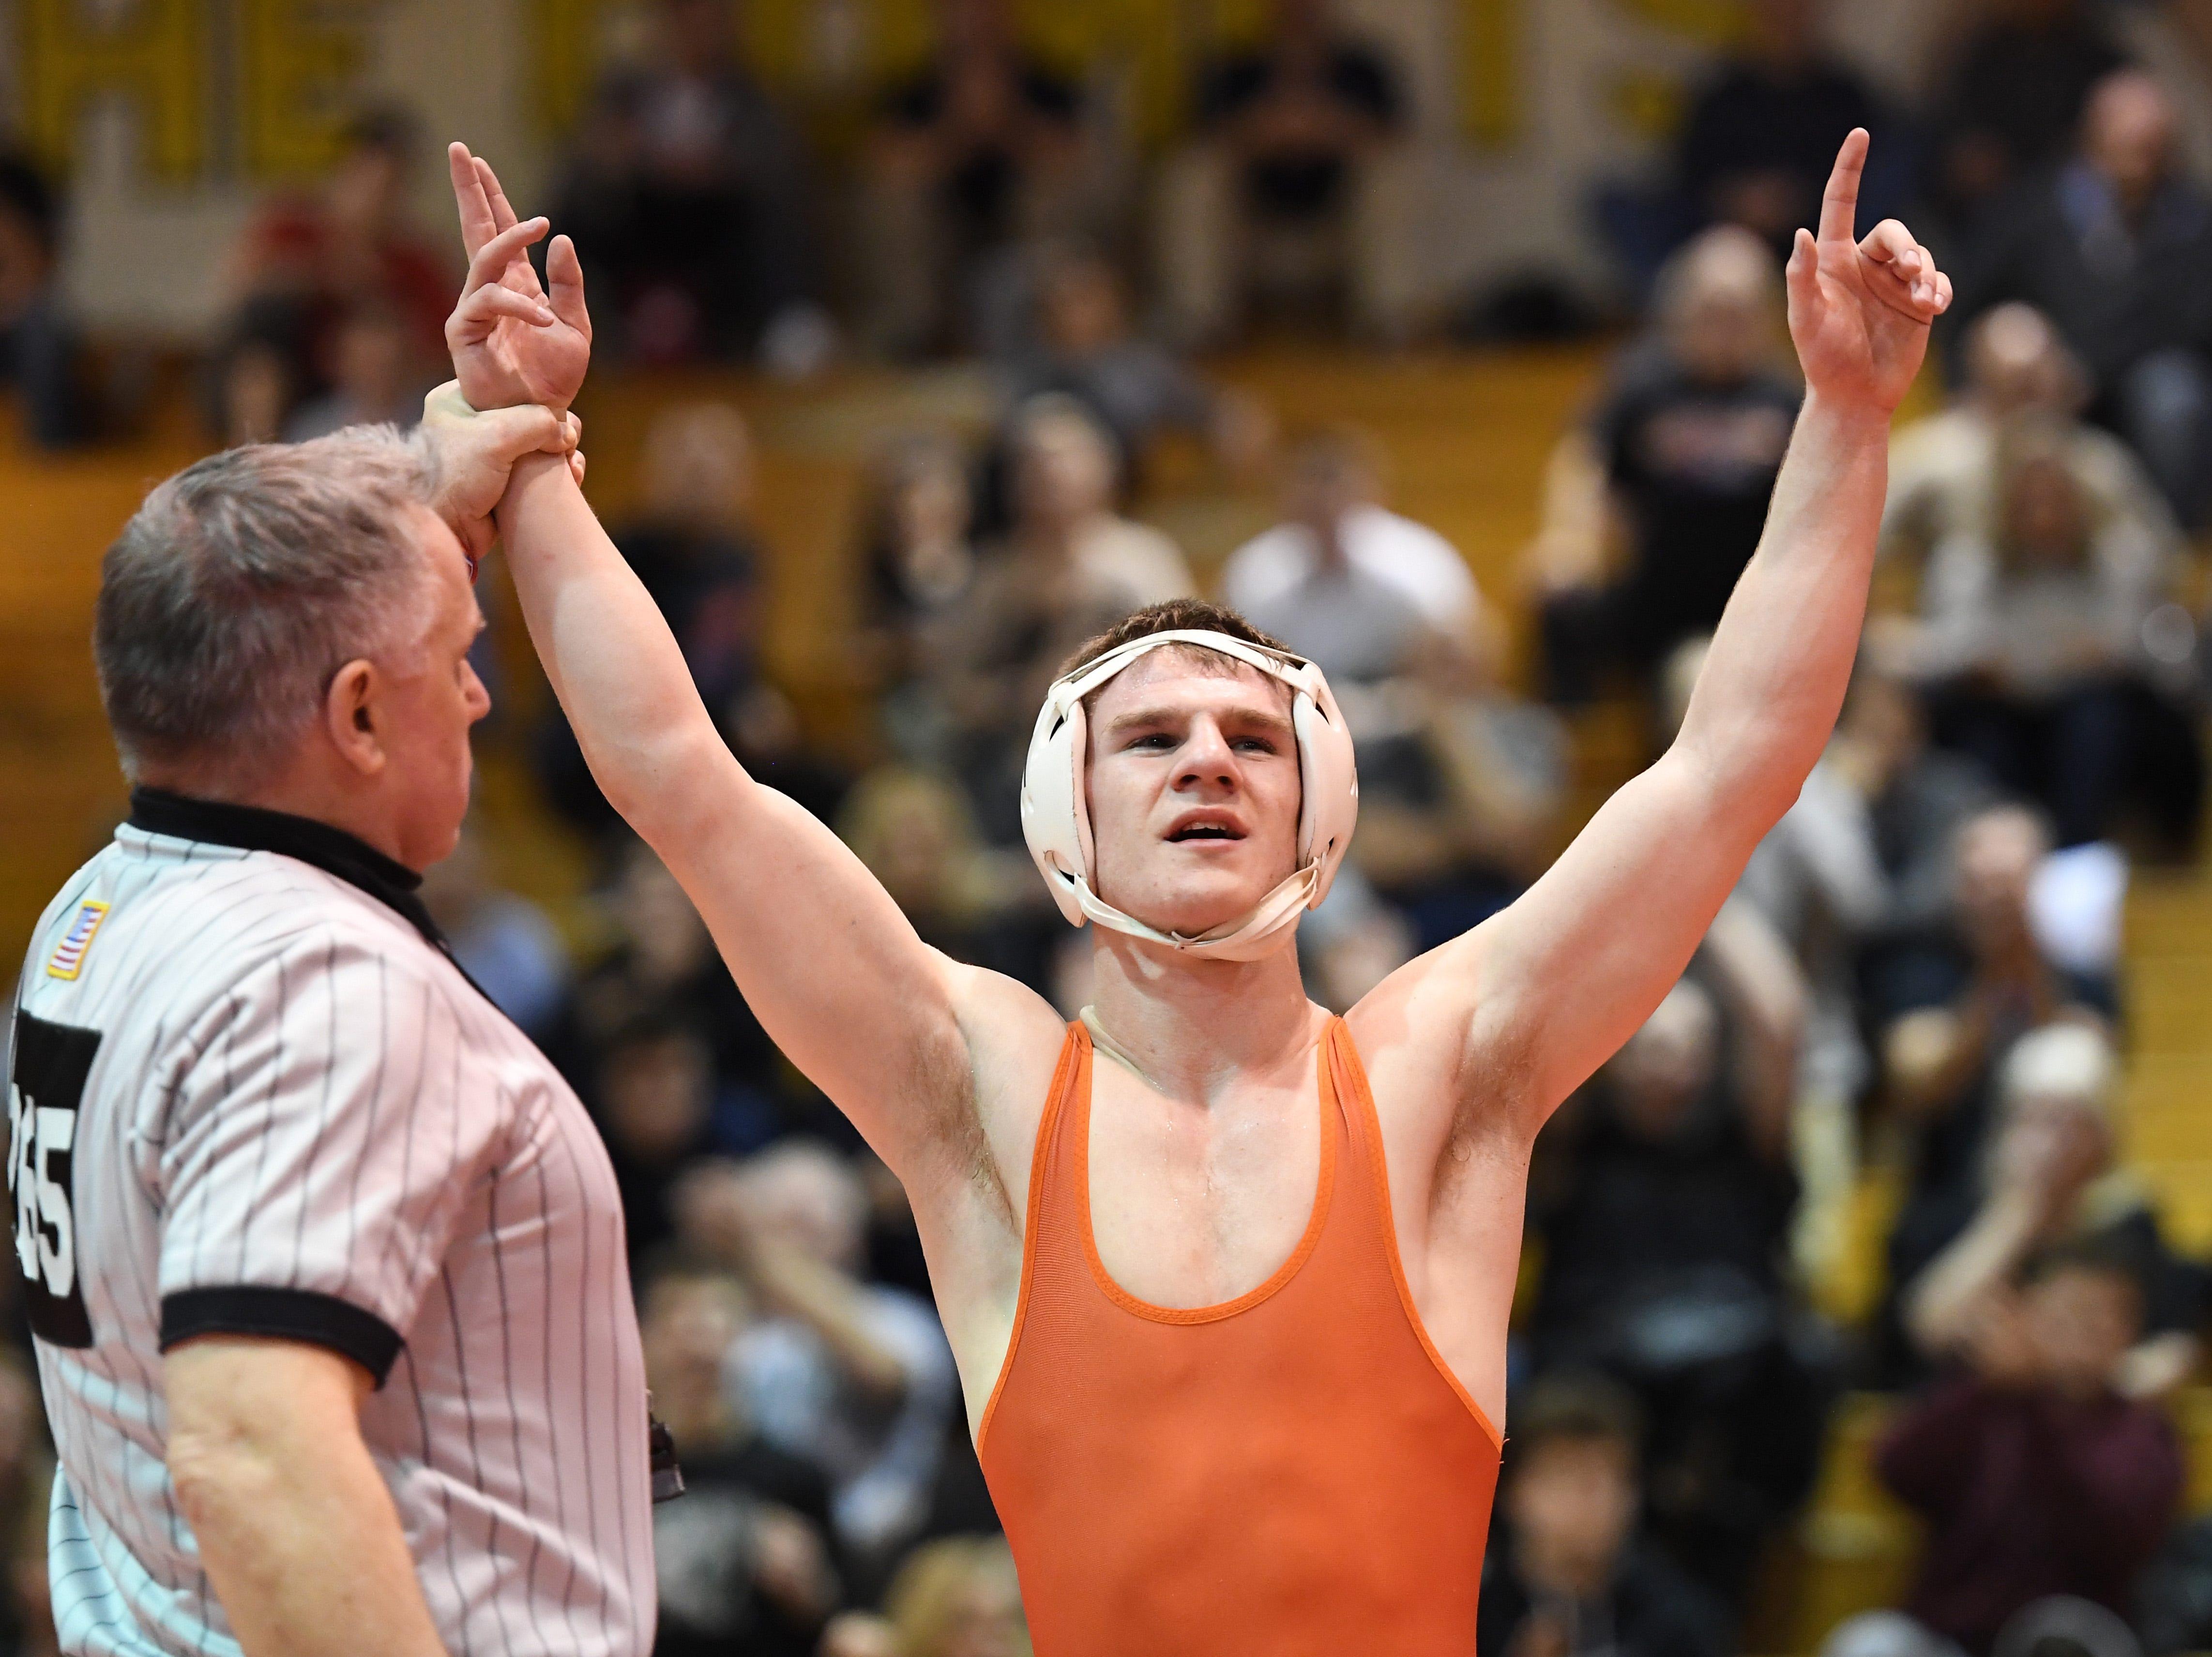 Bergen County wrestling finals at Hackensack High School on Friday, December 28, 2018. Gianni Manginelli (Dumont)  celebrates winning his 126 pound match.